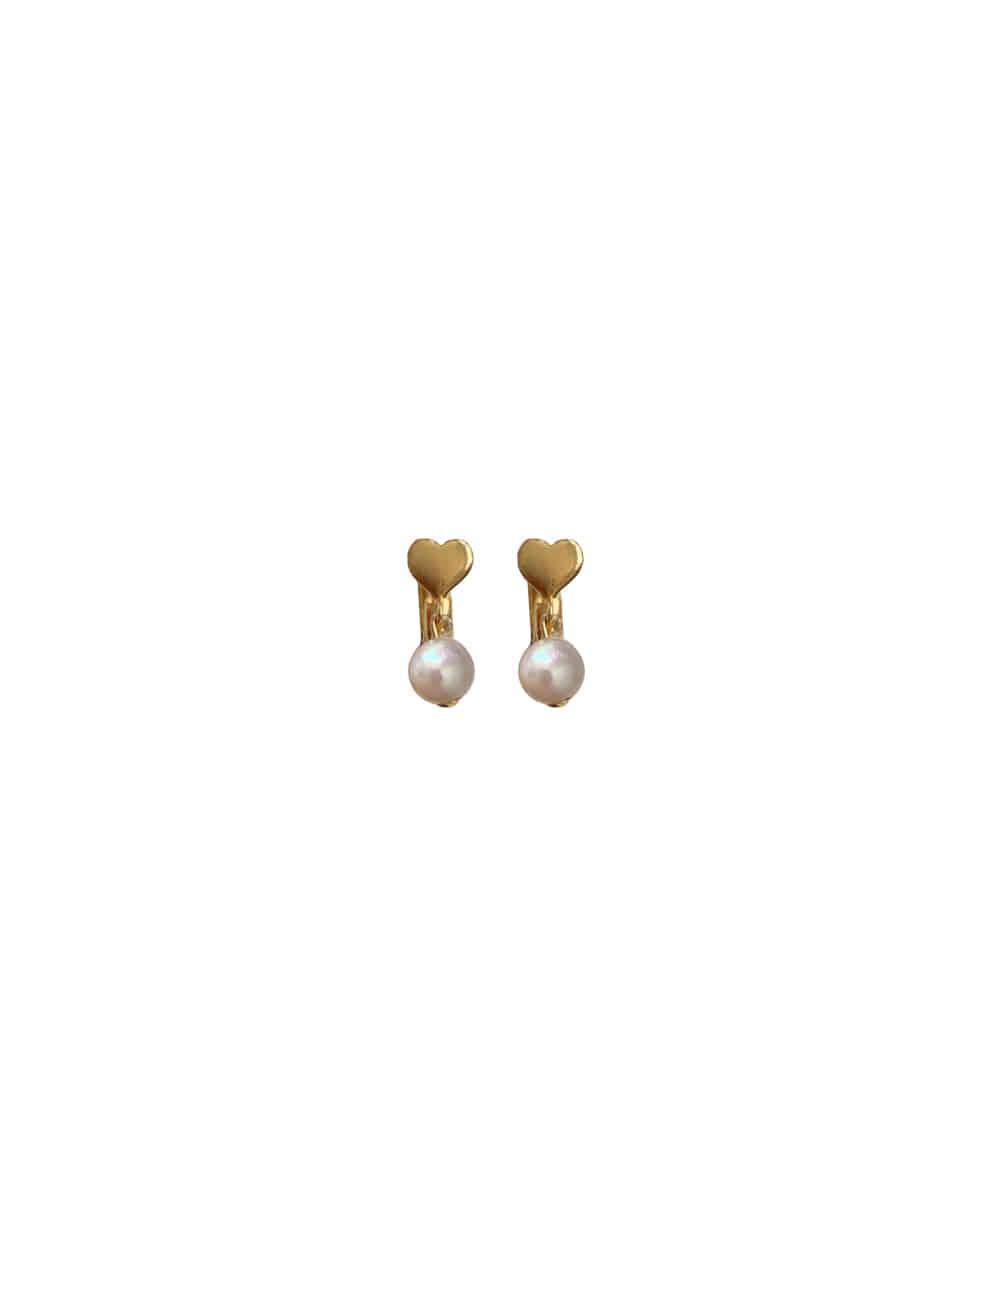 Audrey Silver 925 Mini Heart Earrings _ 미니 하트 진주 원터치 귀걸이 라비쉬에